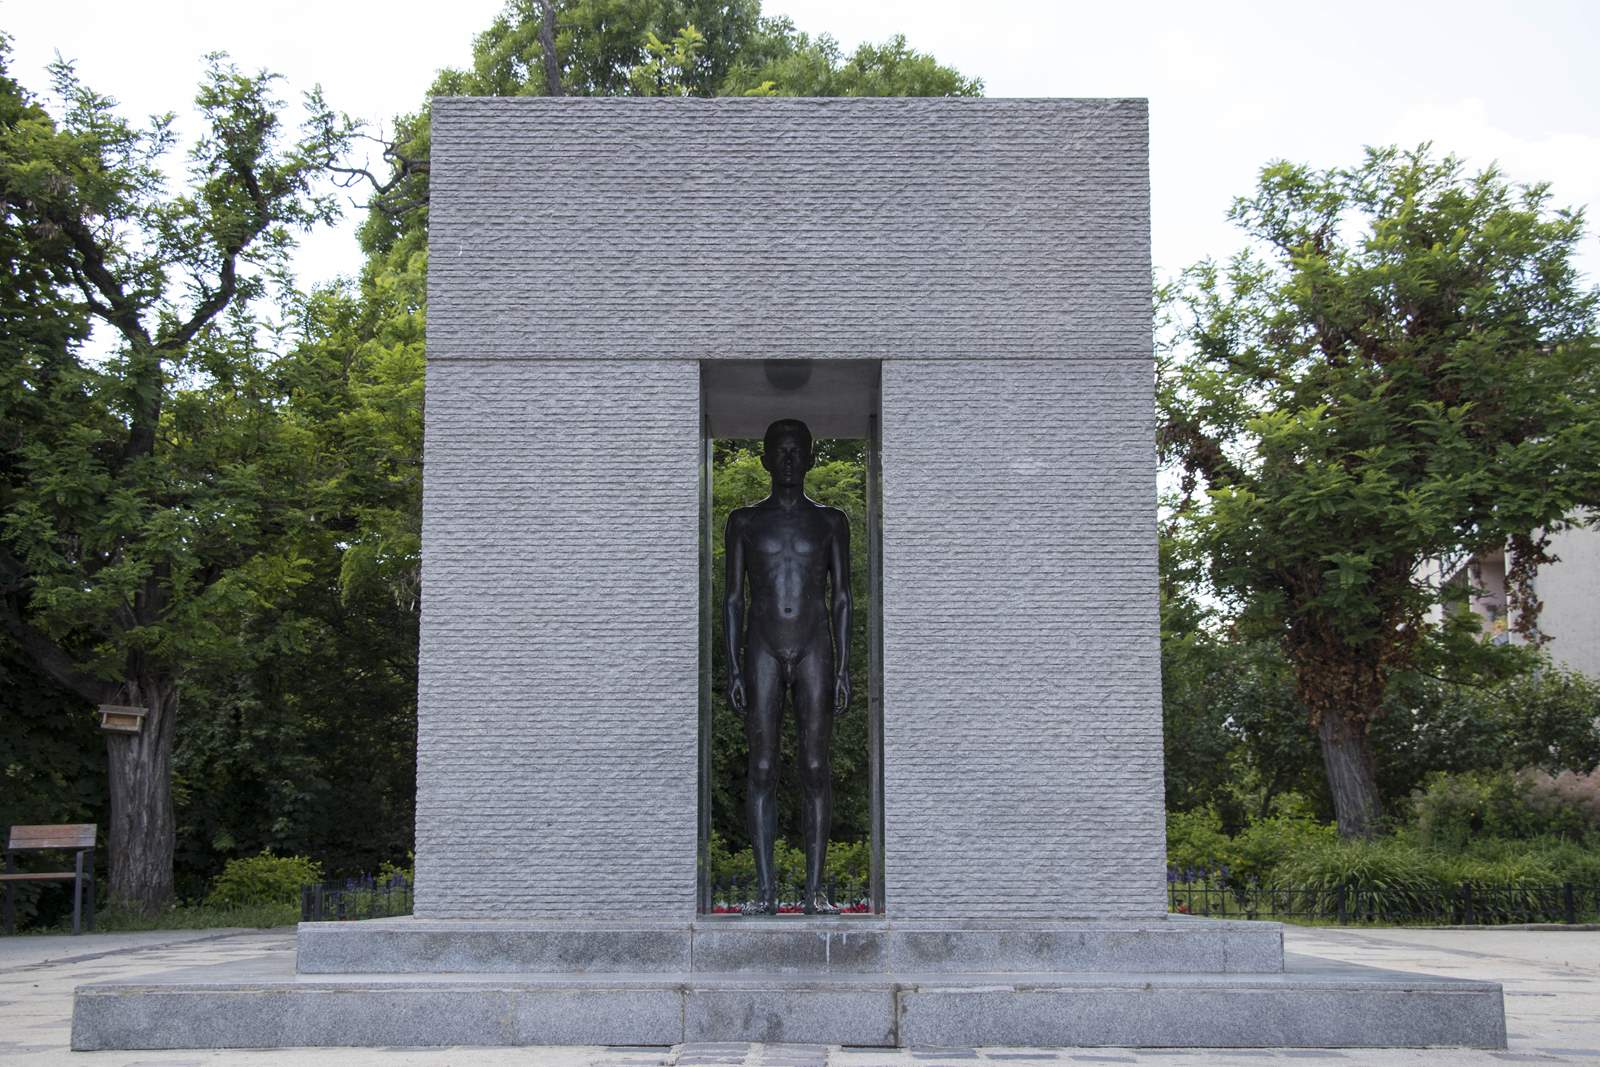 masfeld péter park szobor